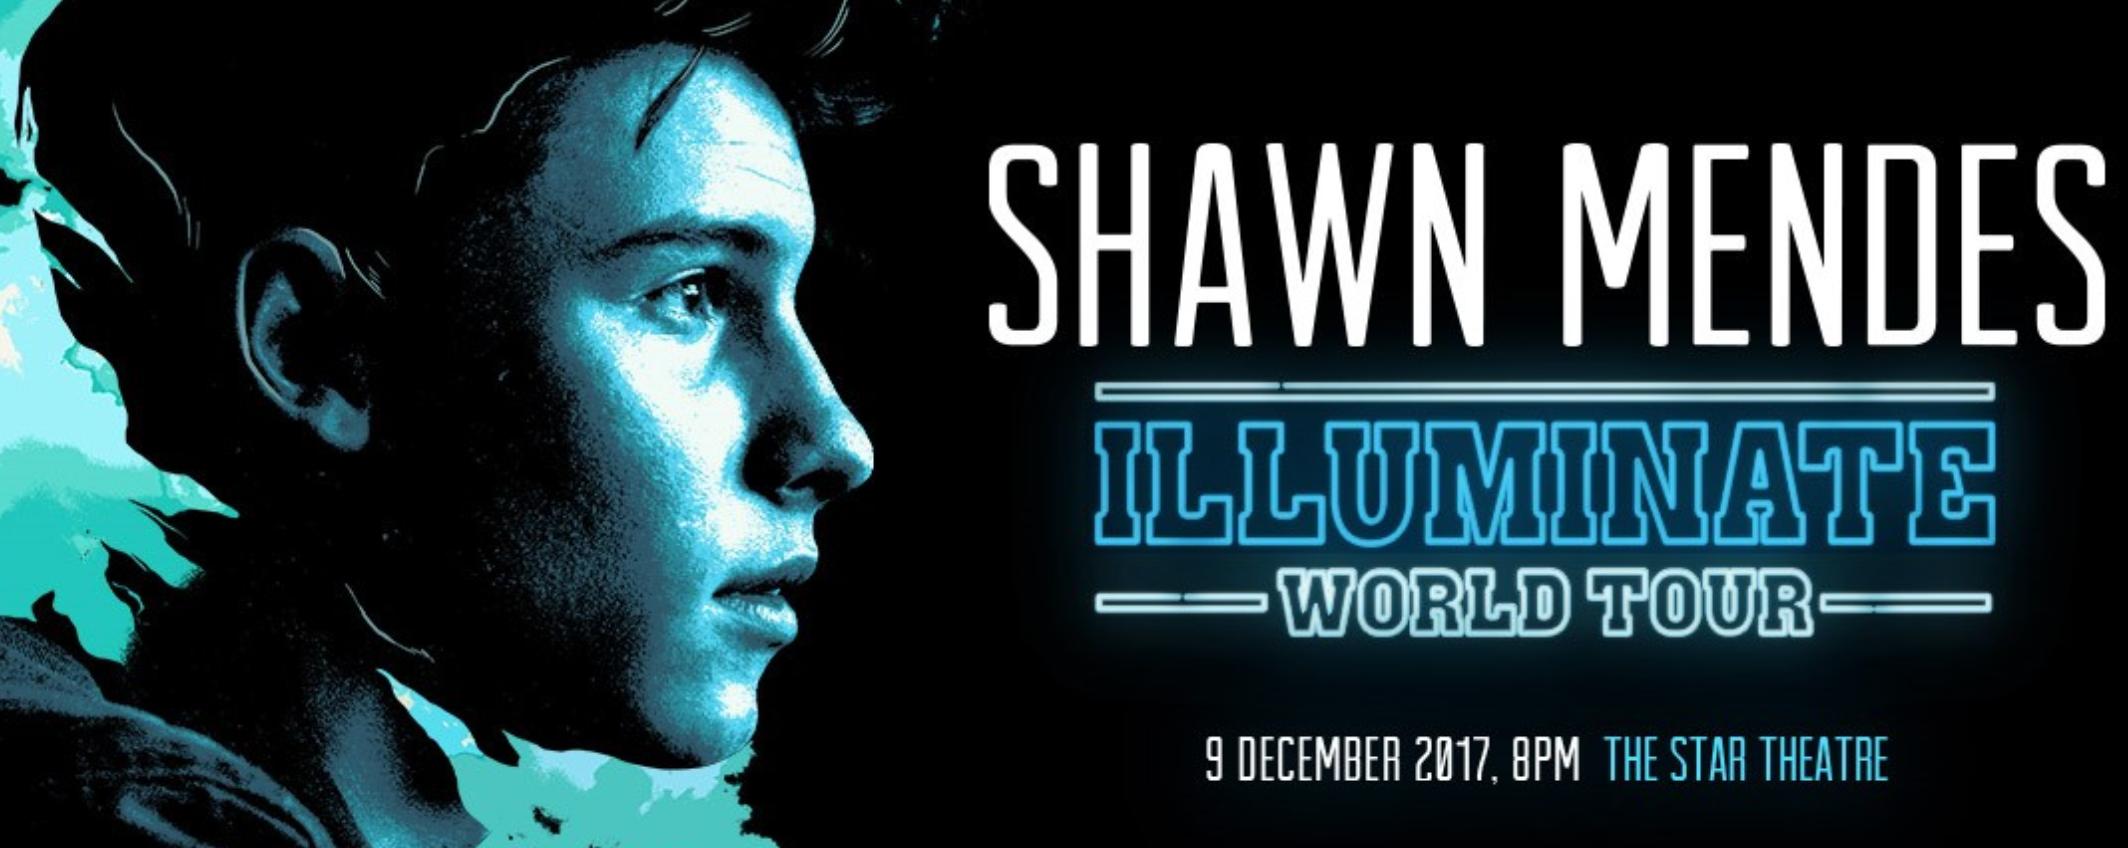 Shawn Mendes - Illuminate World Tour 2017 Singapore